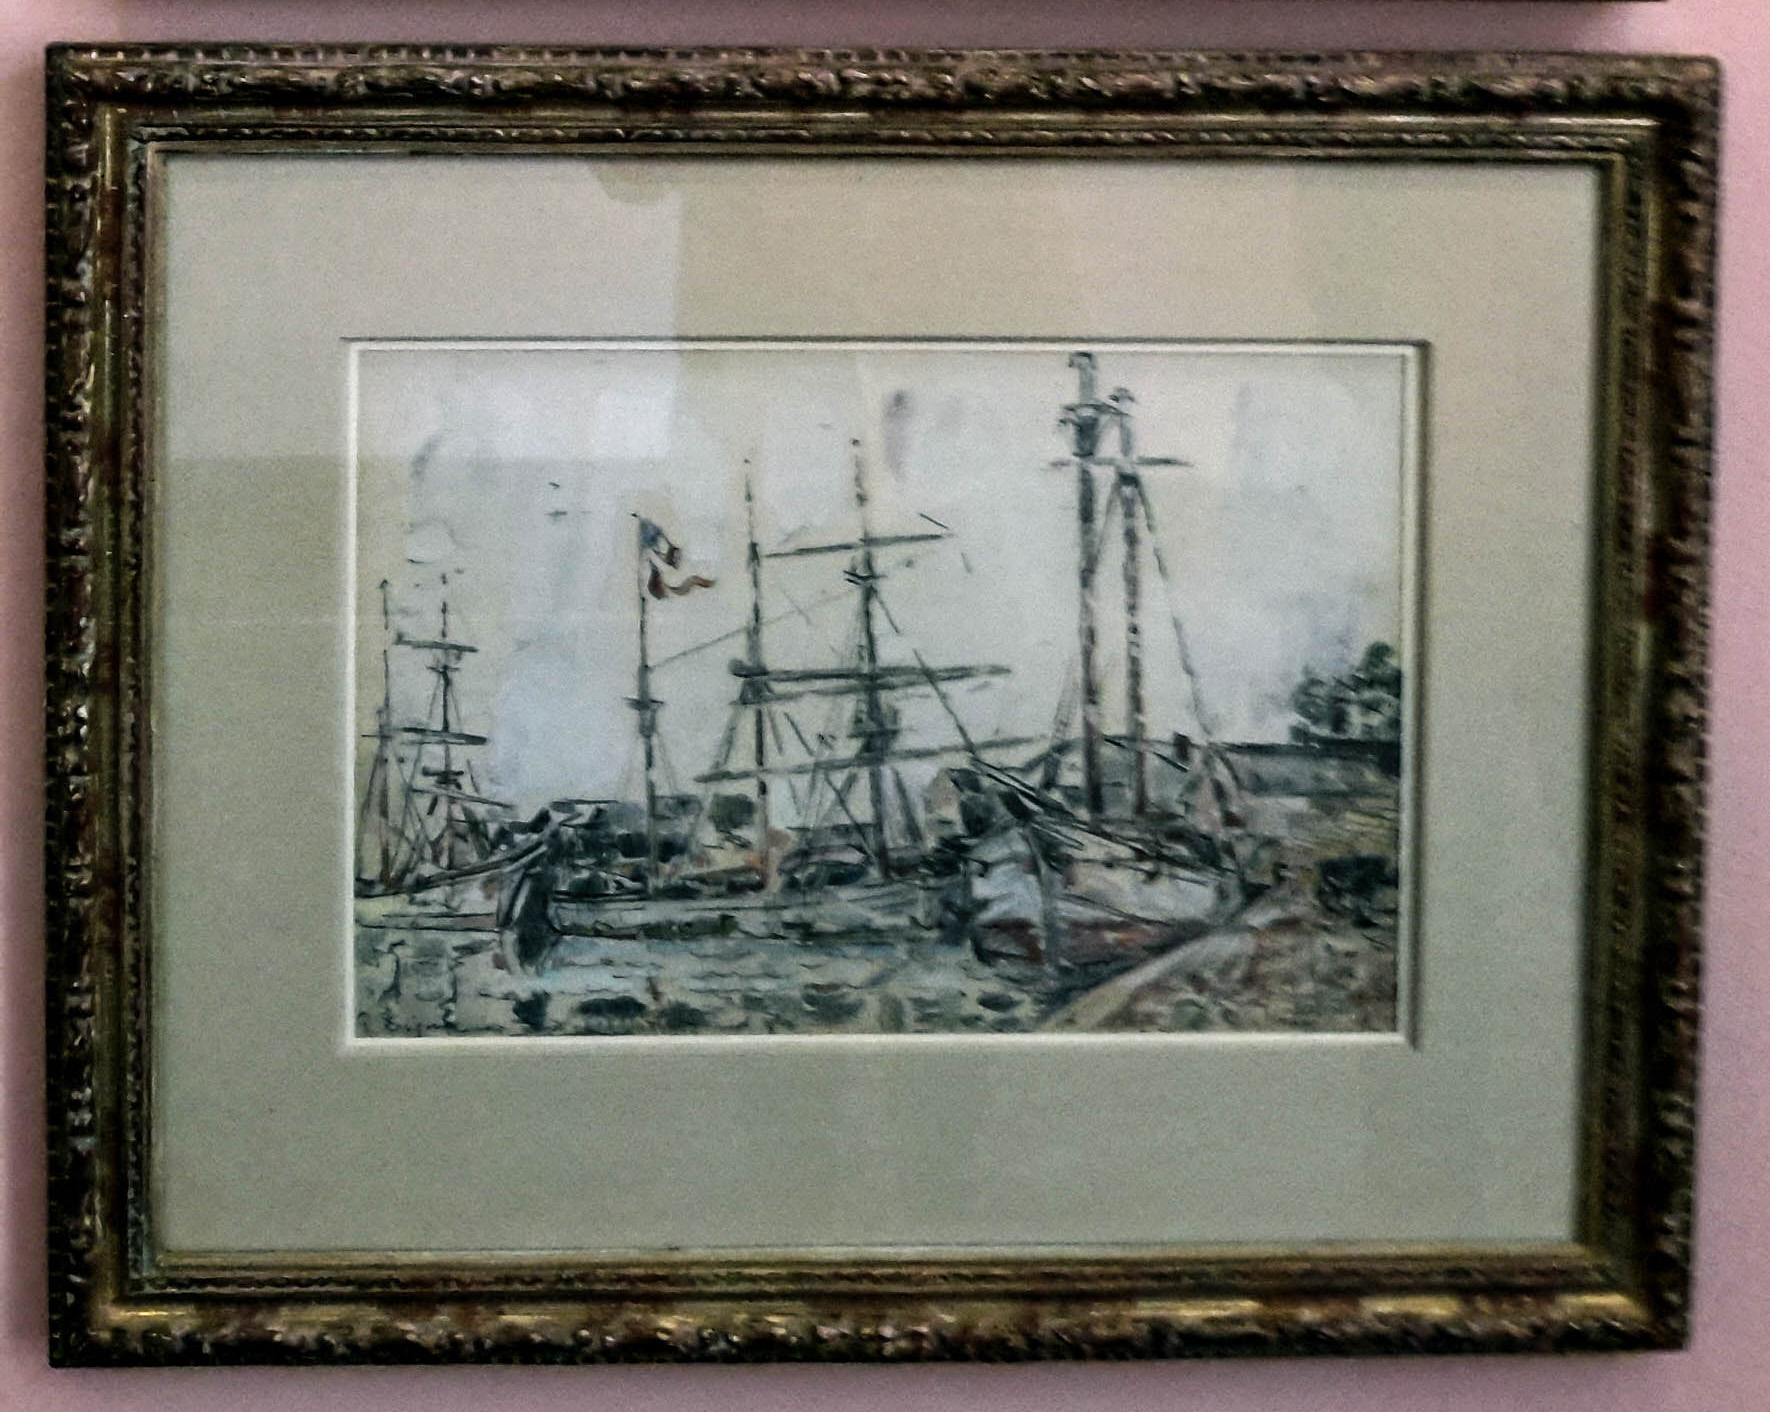 El puerto de Saint-Servan